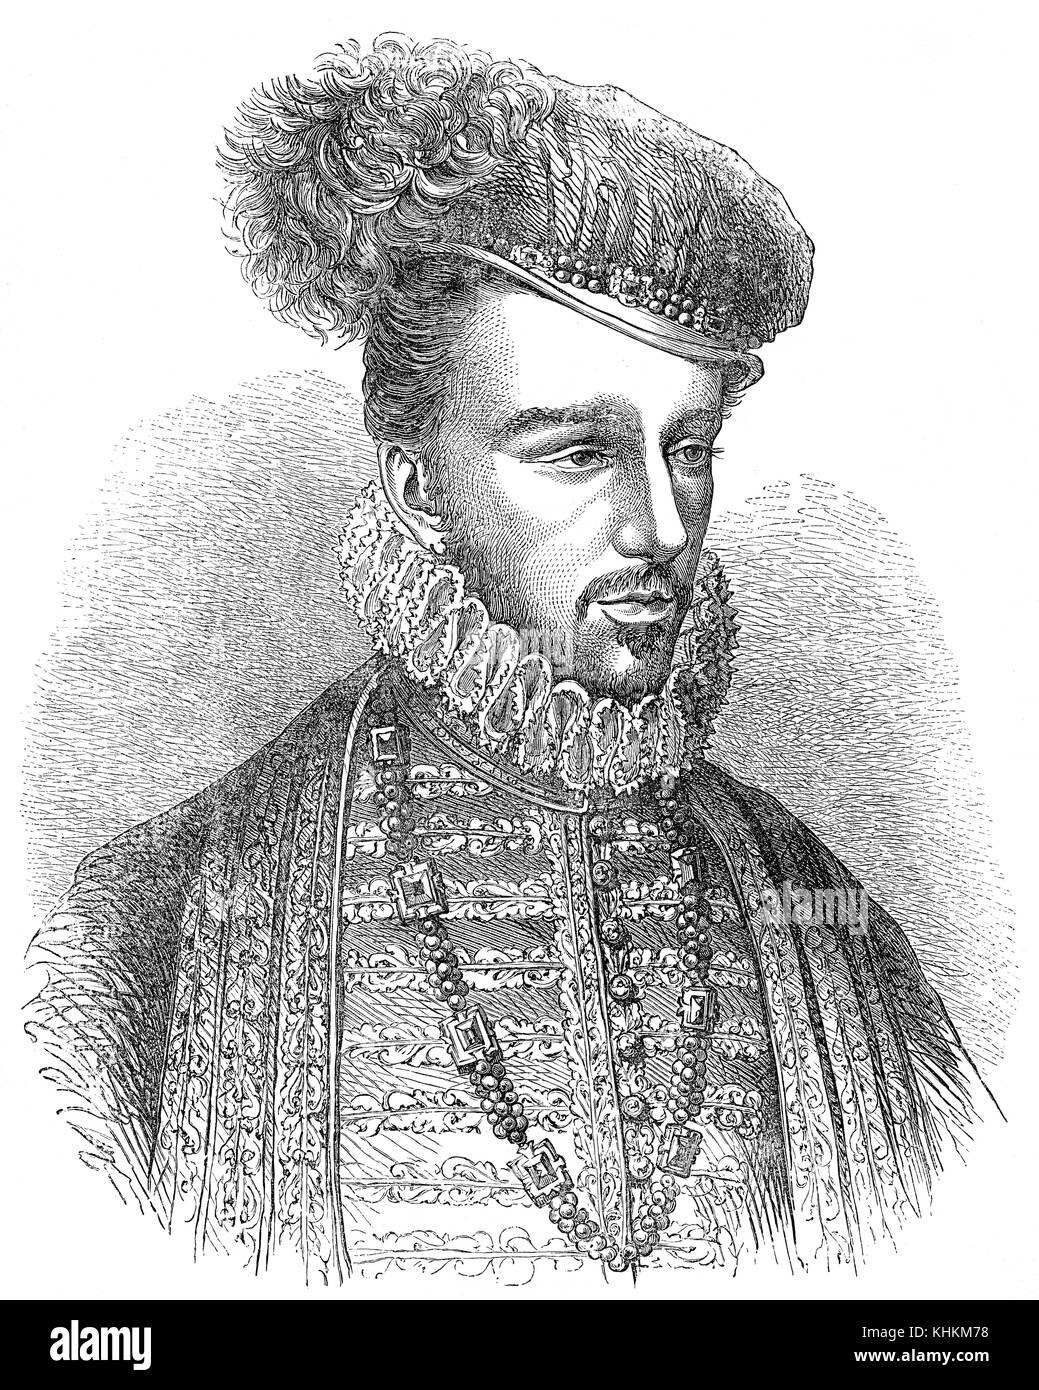 Alfonso d'Este, 1476 – 1534, Duke of Ferrara - Stock Image